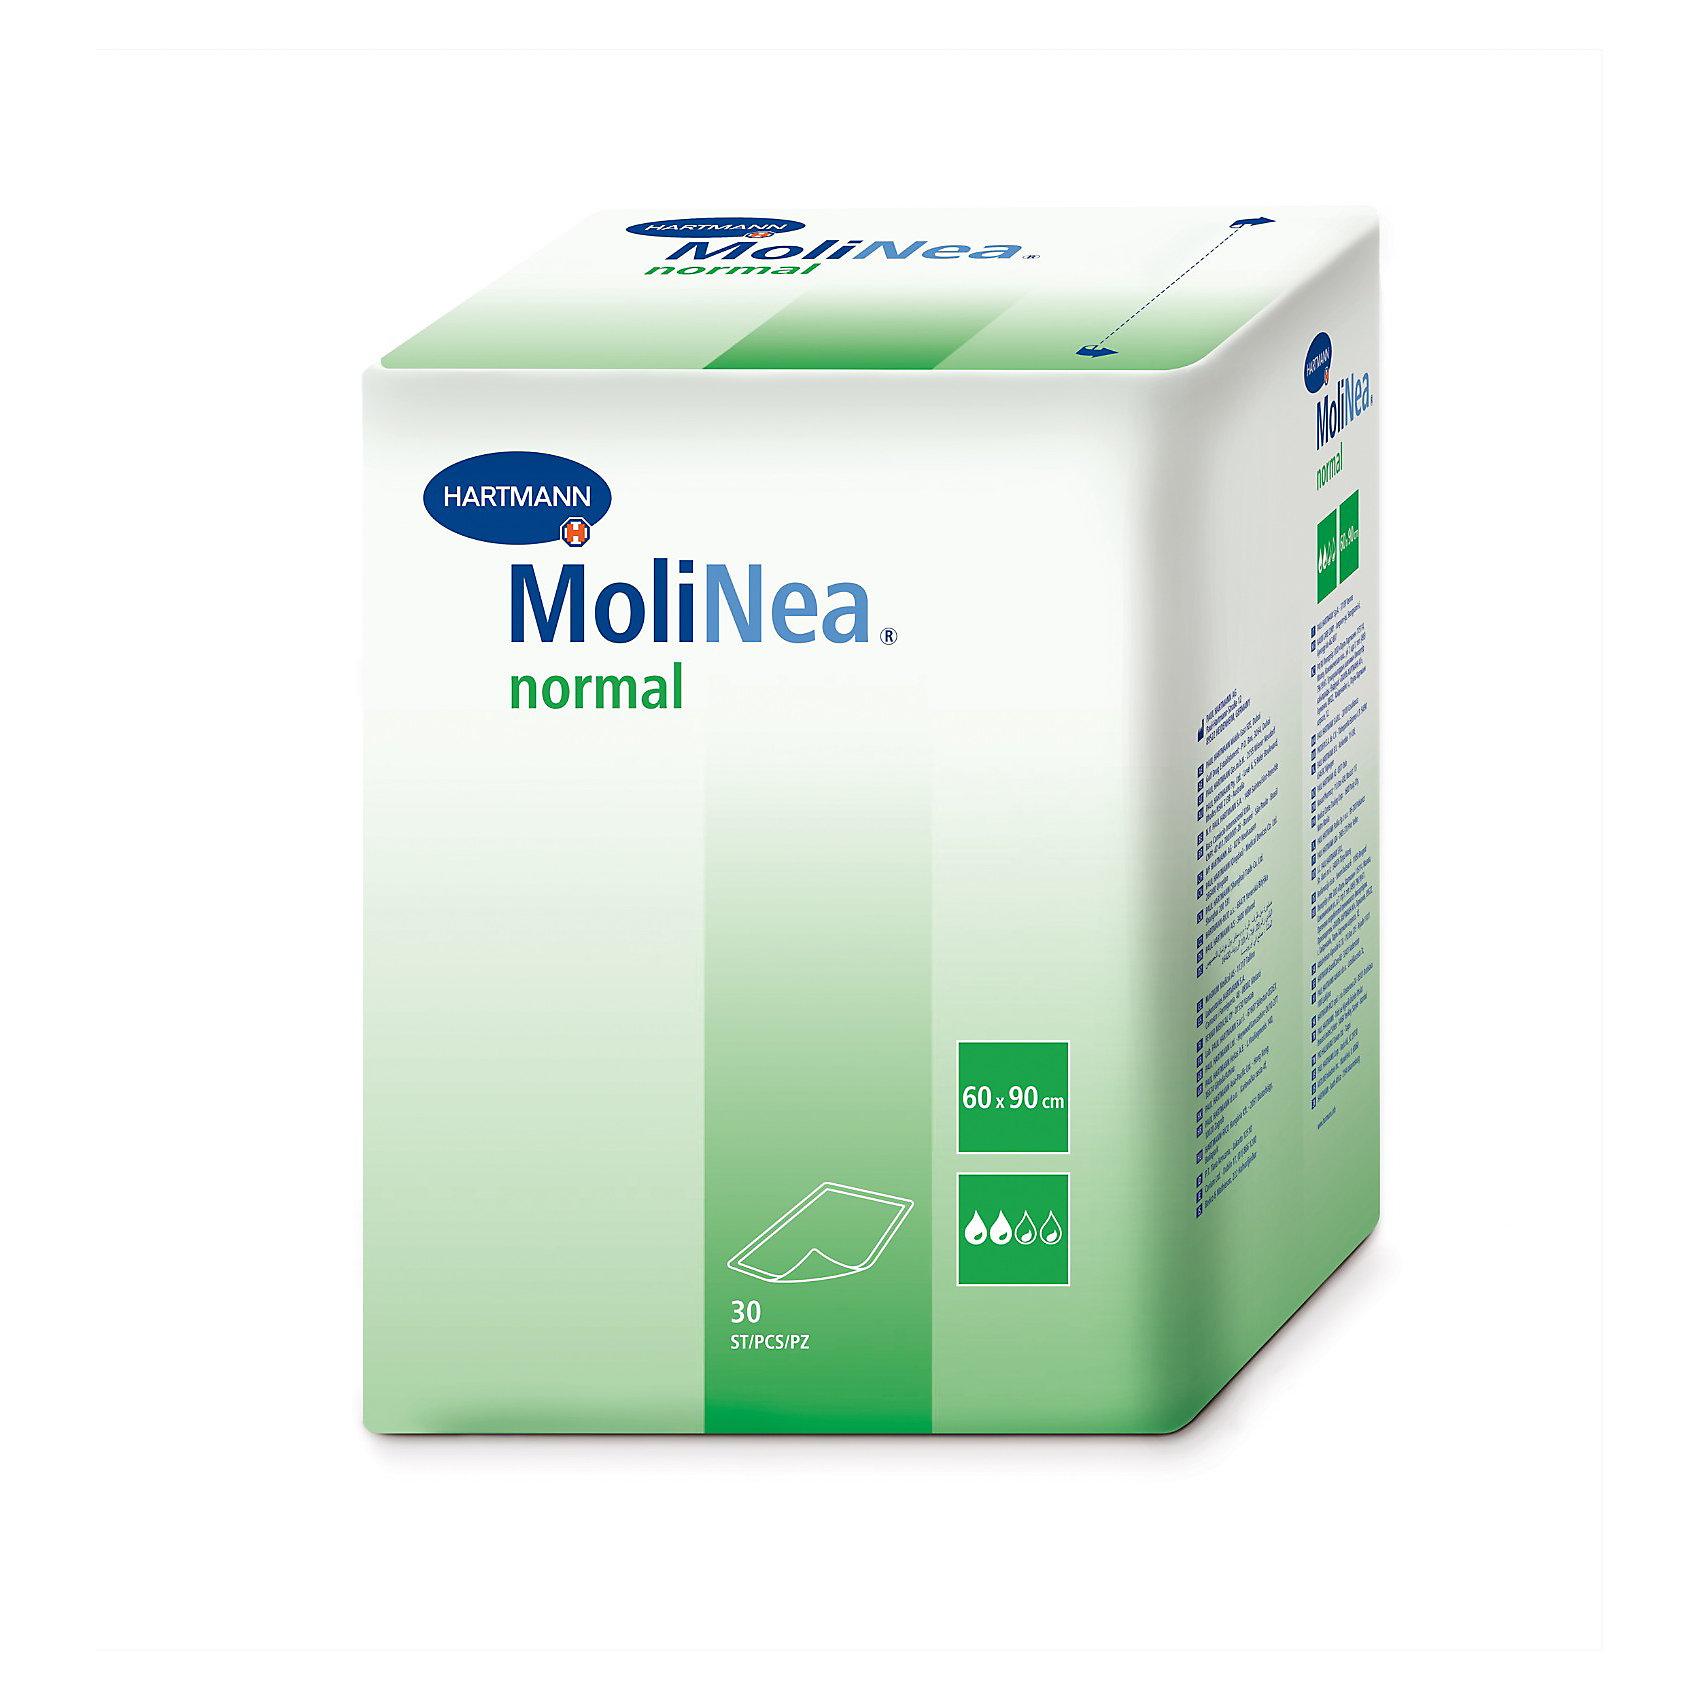 MoliNea Детские впитывающие пеленки MoliNea Normal, 60х90 см., 30 шт